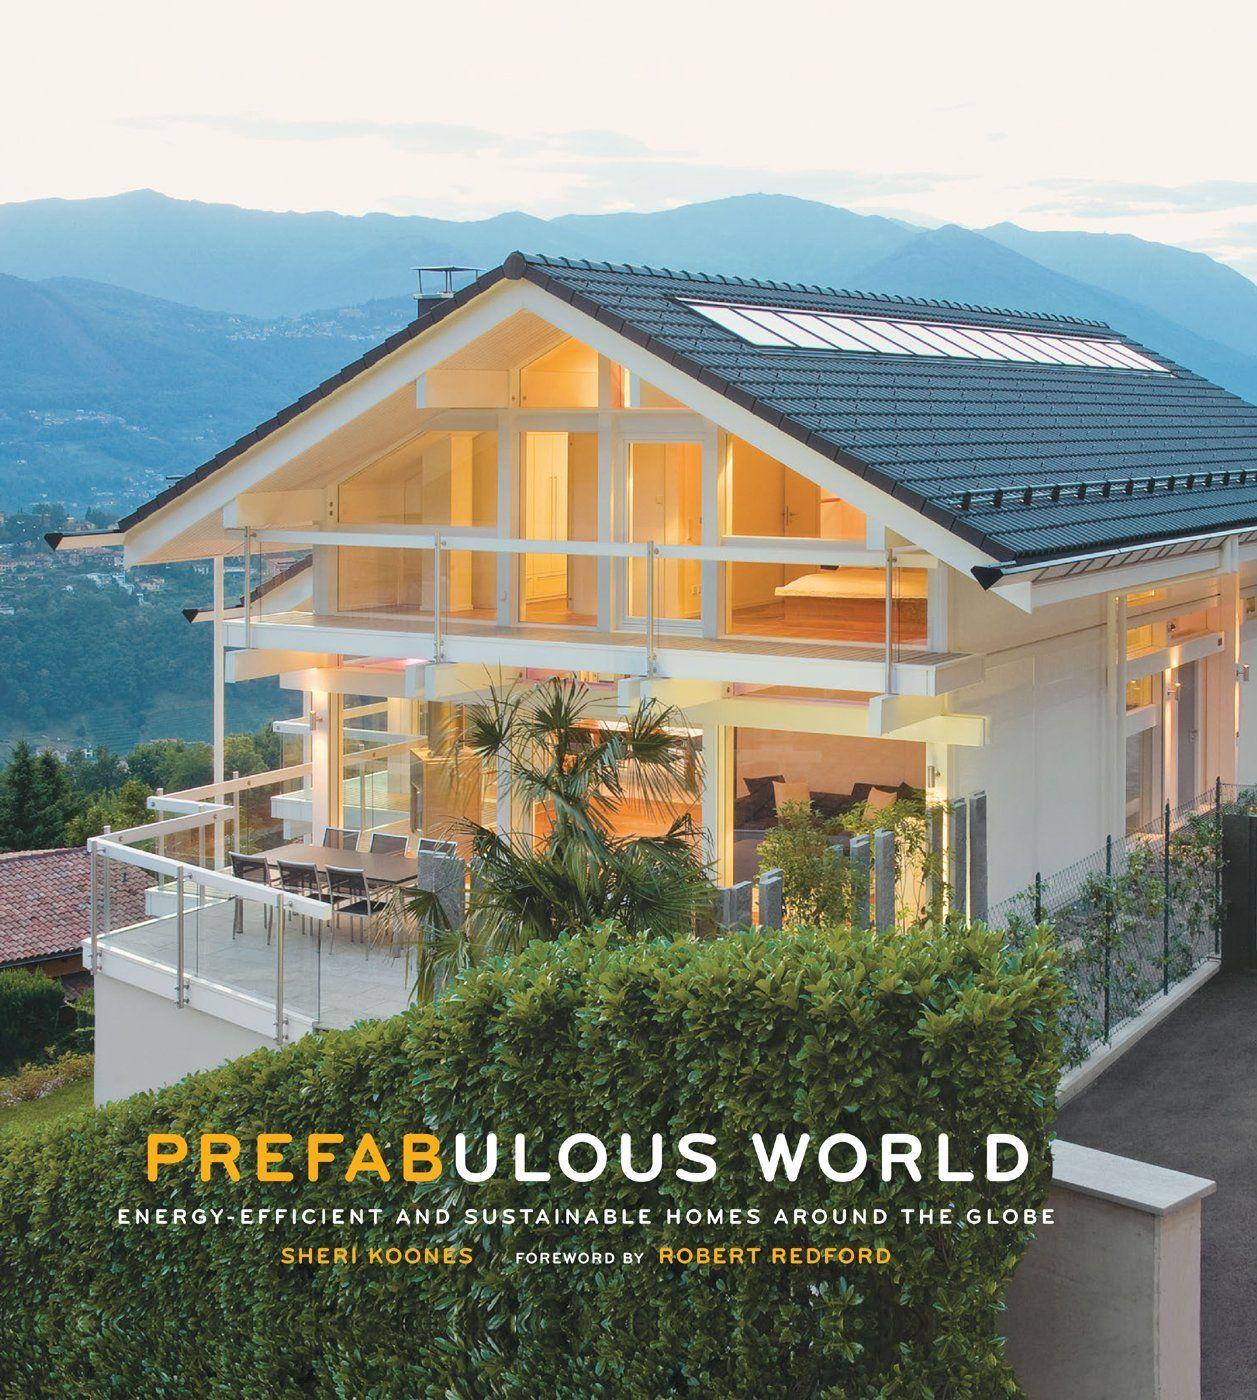 Prefabulous World: Energy-Efficient and Sustainable Homes Around the Globe eBook: Sheri Koones, Robert Redford: Amazon.ca: Kindle Store